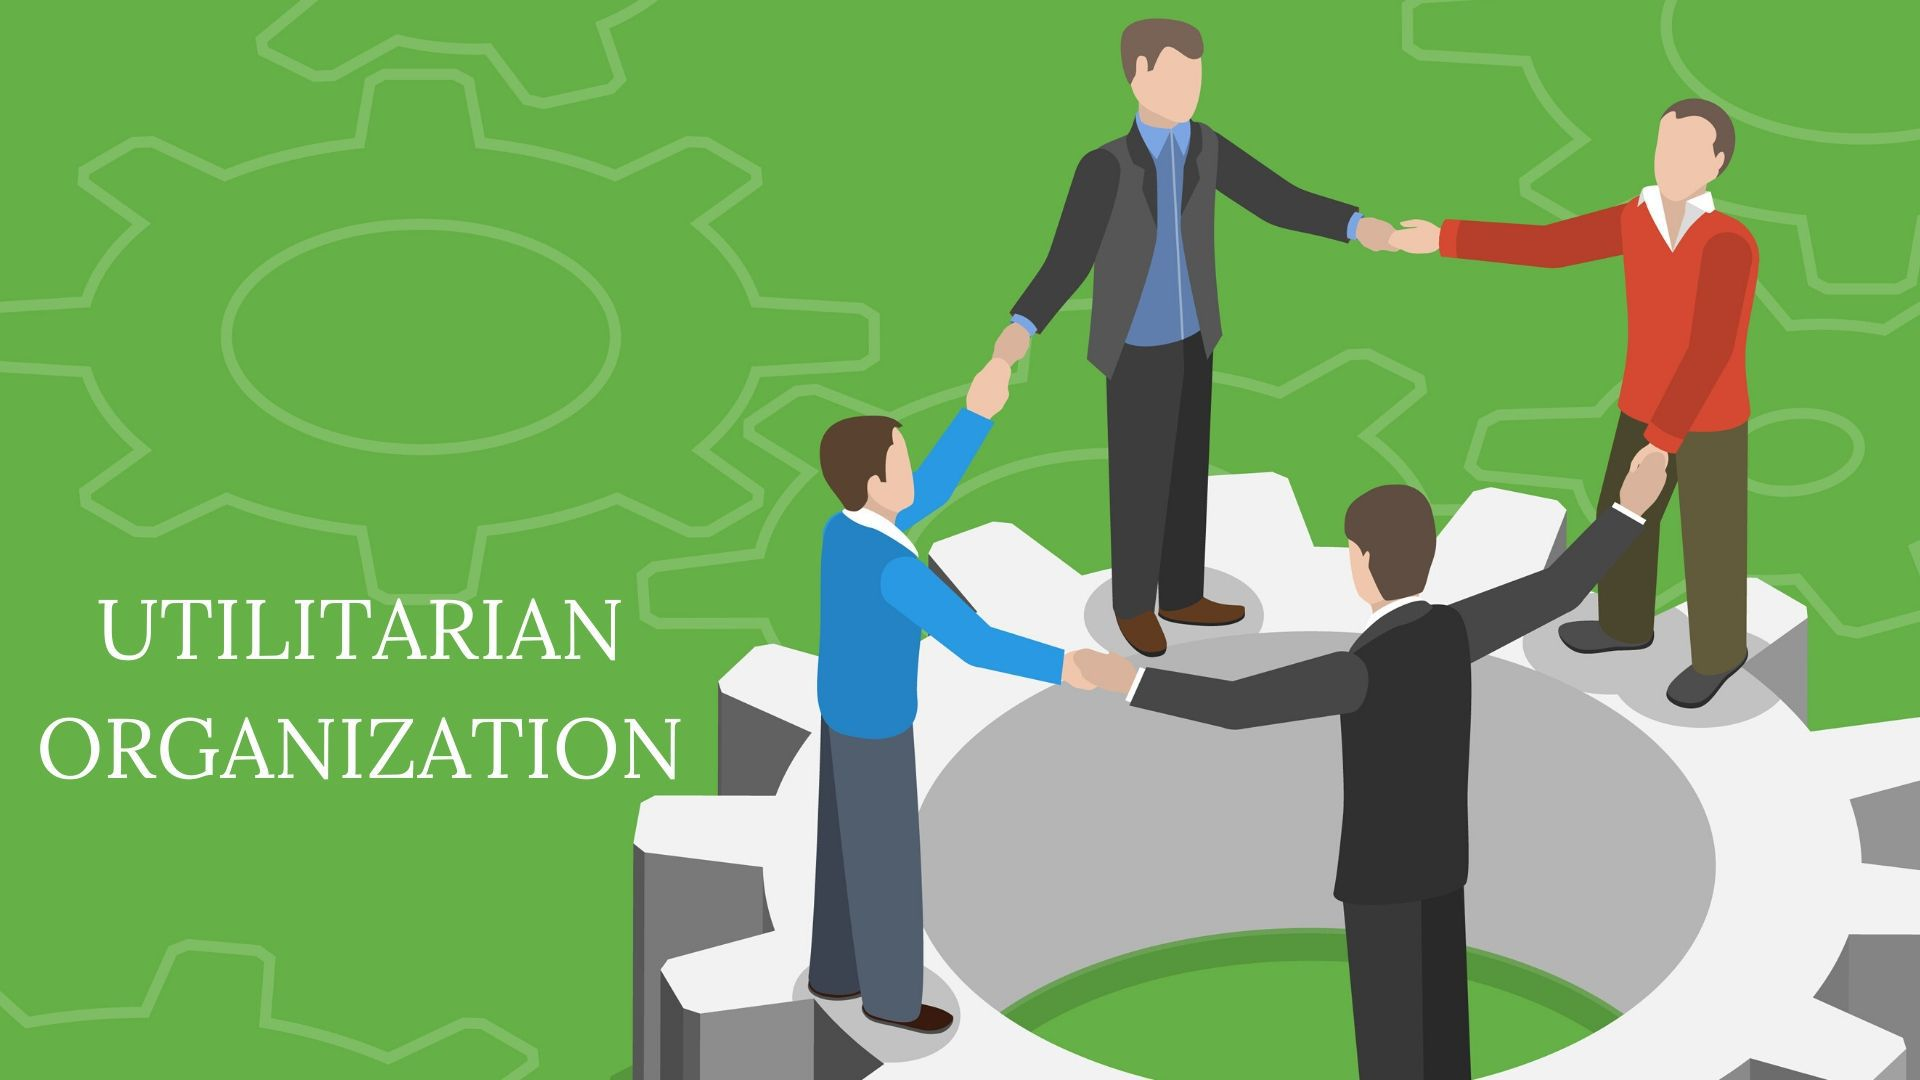 What is Utilitarian Organization